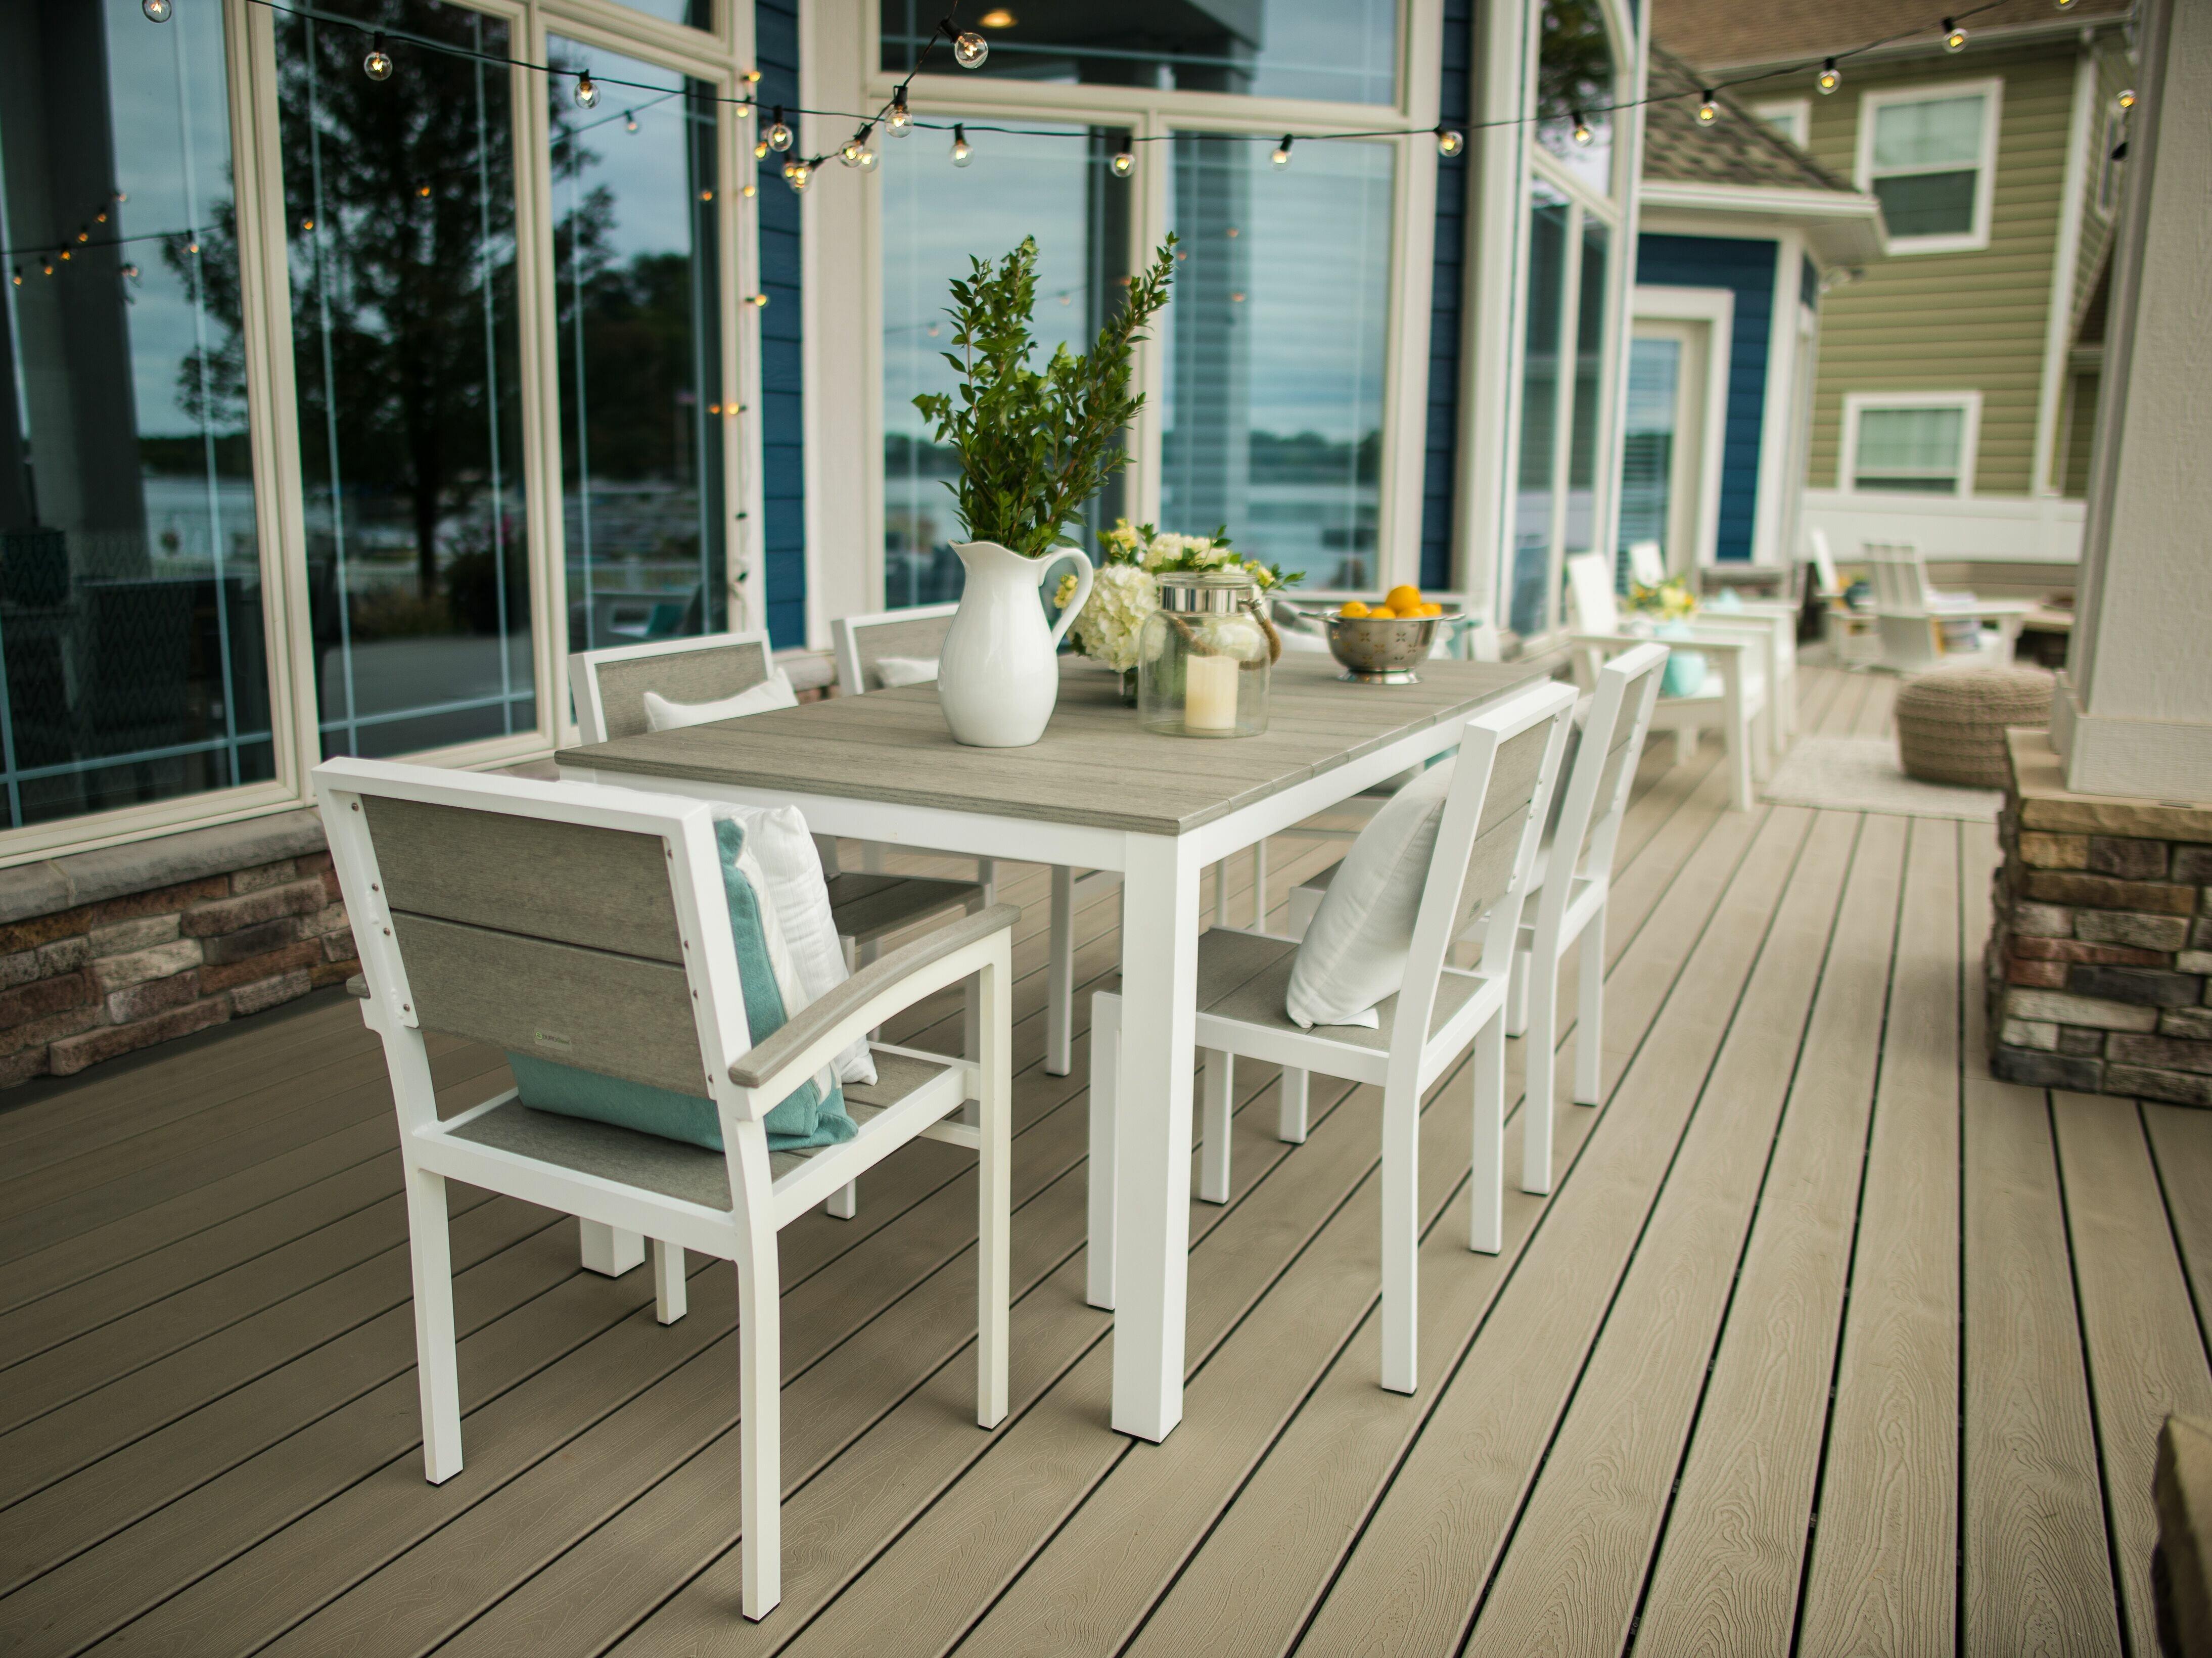 Modern rustic interiors gavin outdoor 7 piece dining set - Outdoor interiors 7 piece patio set ...